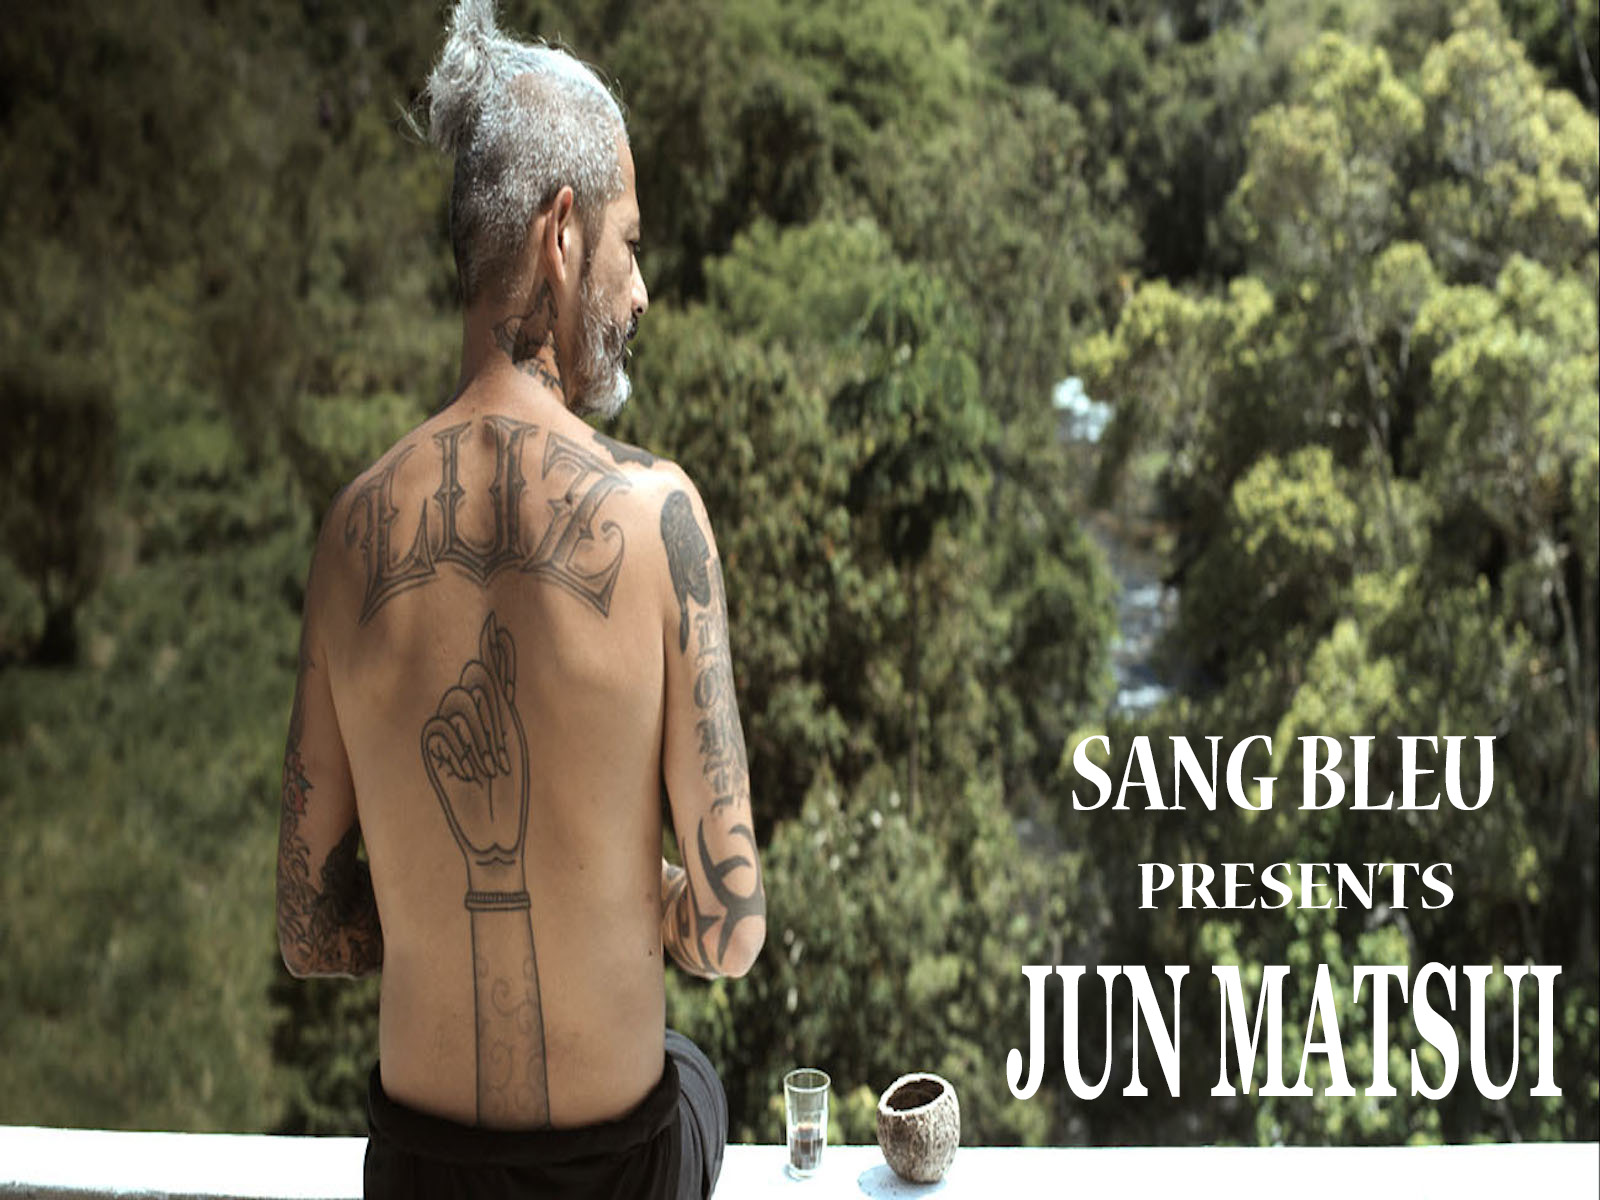 SANG BLEU PRESENTS JUN MATSUI